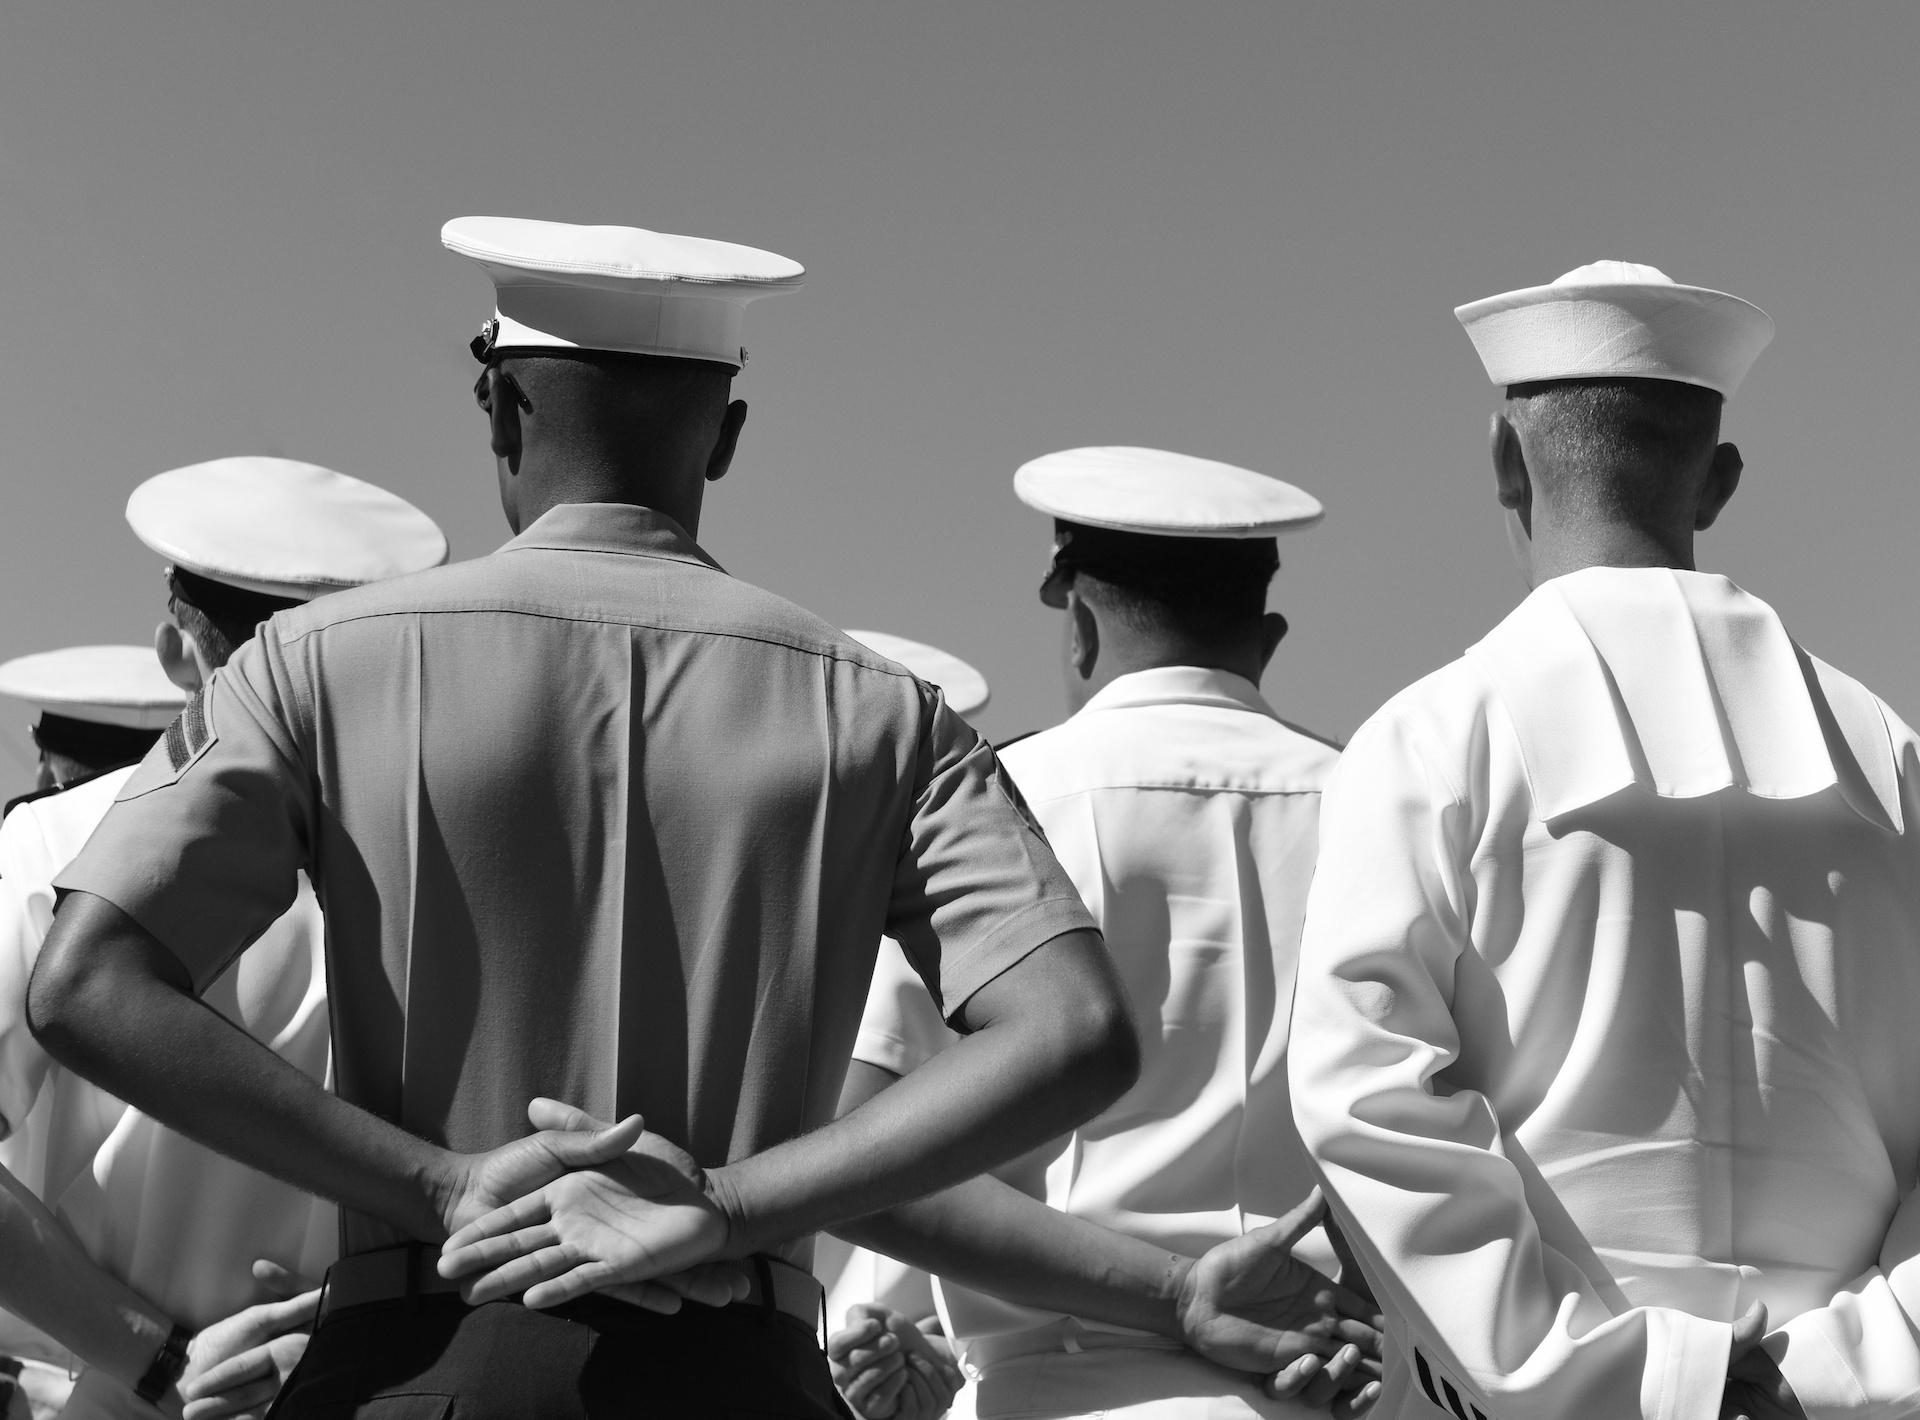 Image of article 'Top 3 Reasons Why Veterans Make Successful Entrepreneurs'